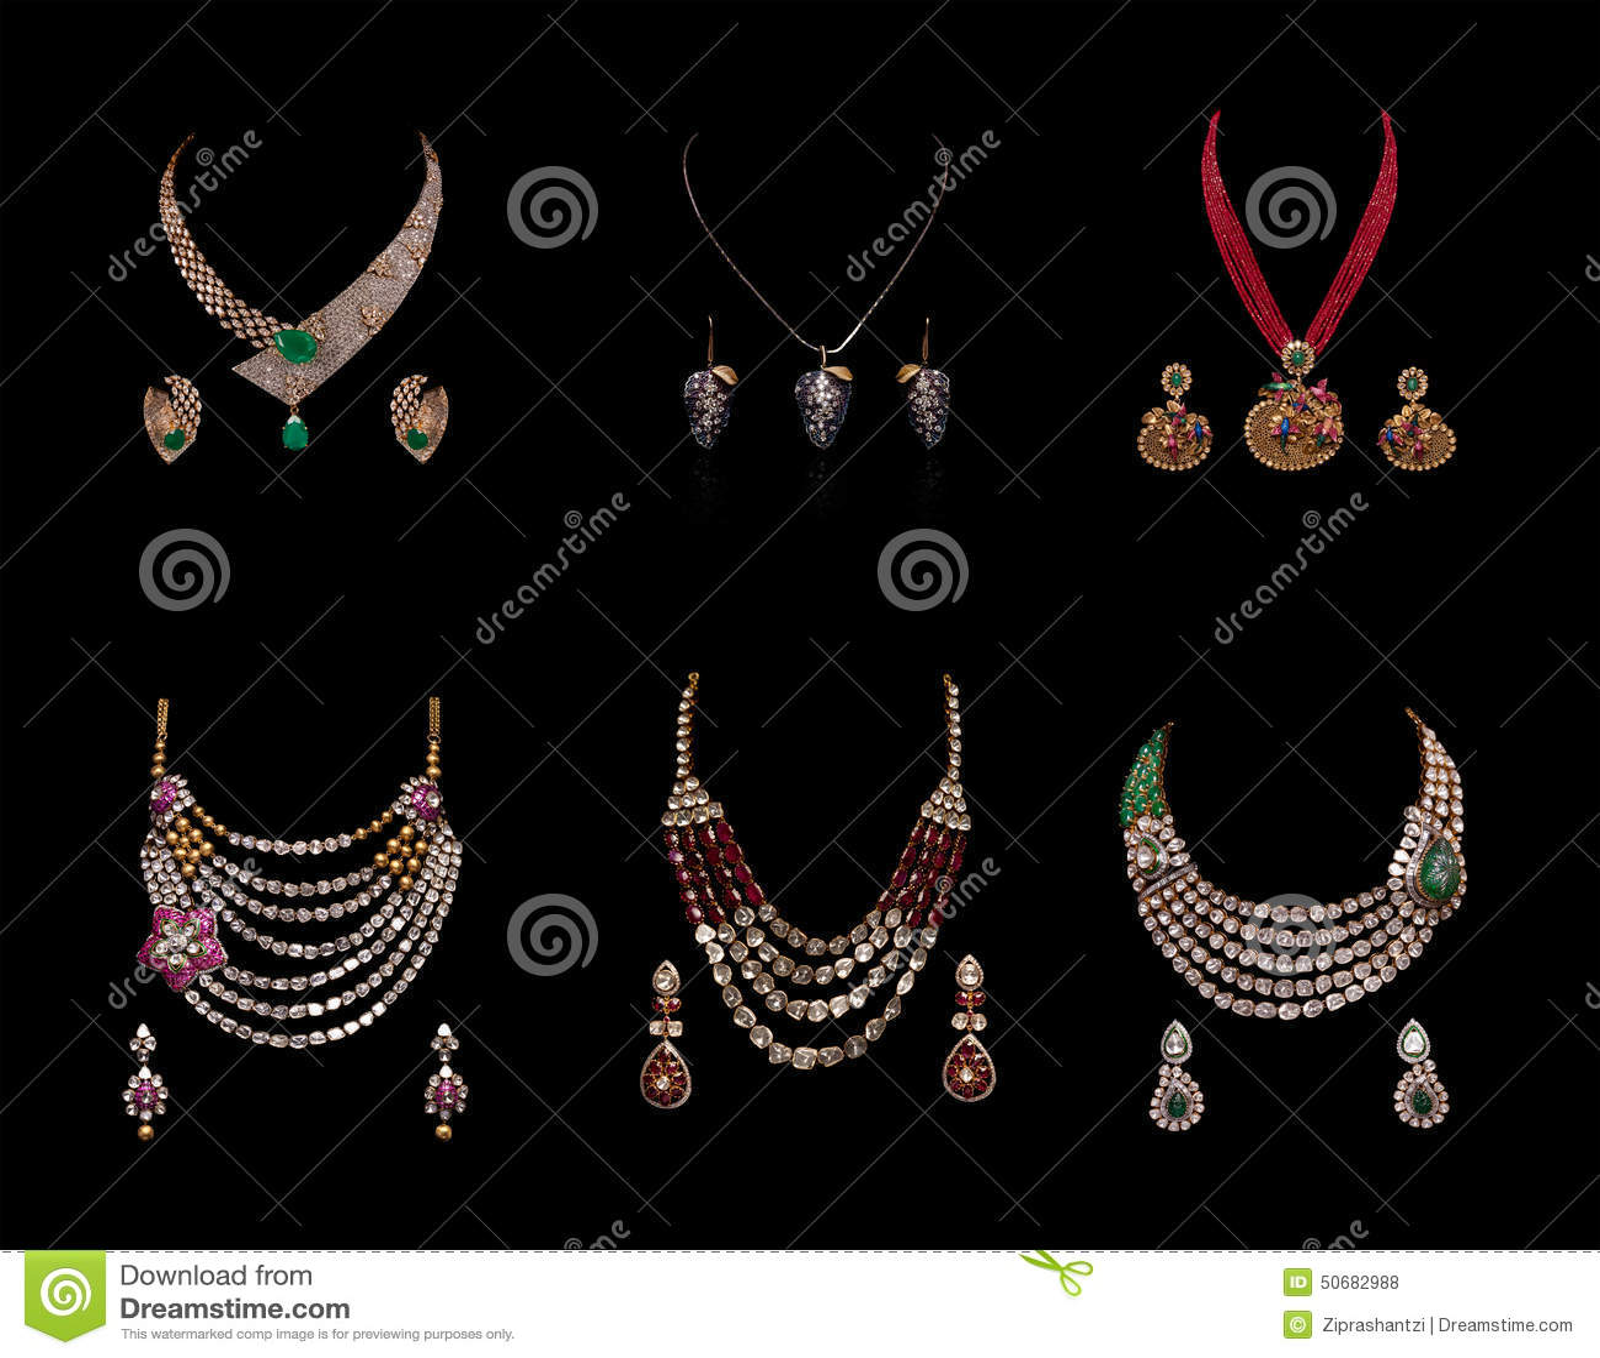 Download 金刚石neclaces的汇集与耳环的 库存照片. 图片 包括有 玻璃, 等级, 阔气, 粉红色, 珠宝, 消耗大 - 50682988